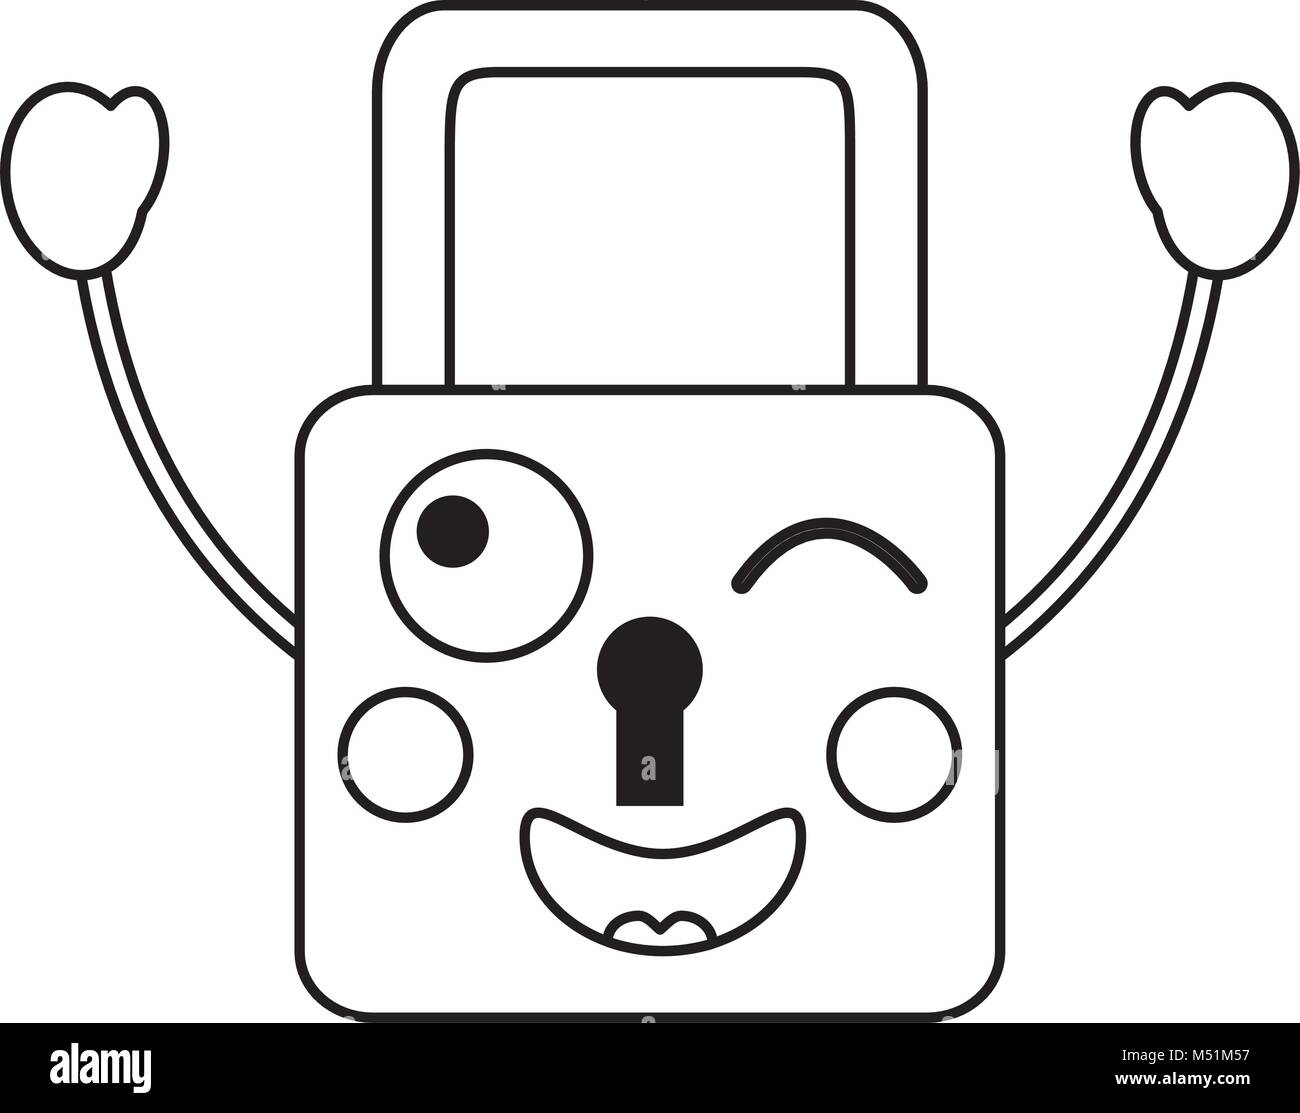 Key Joke Stock Photos & Key Joke Stock Images - Alamy